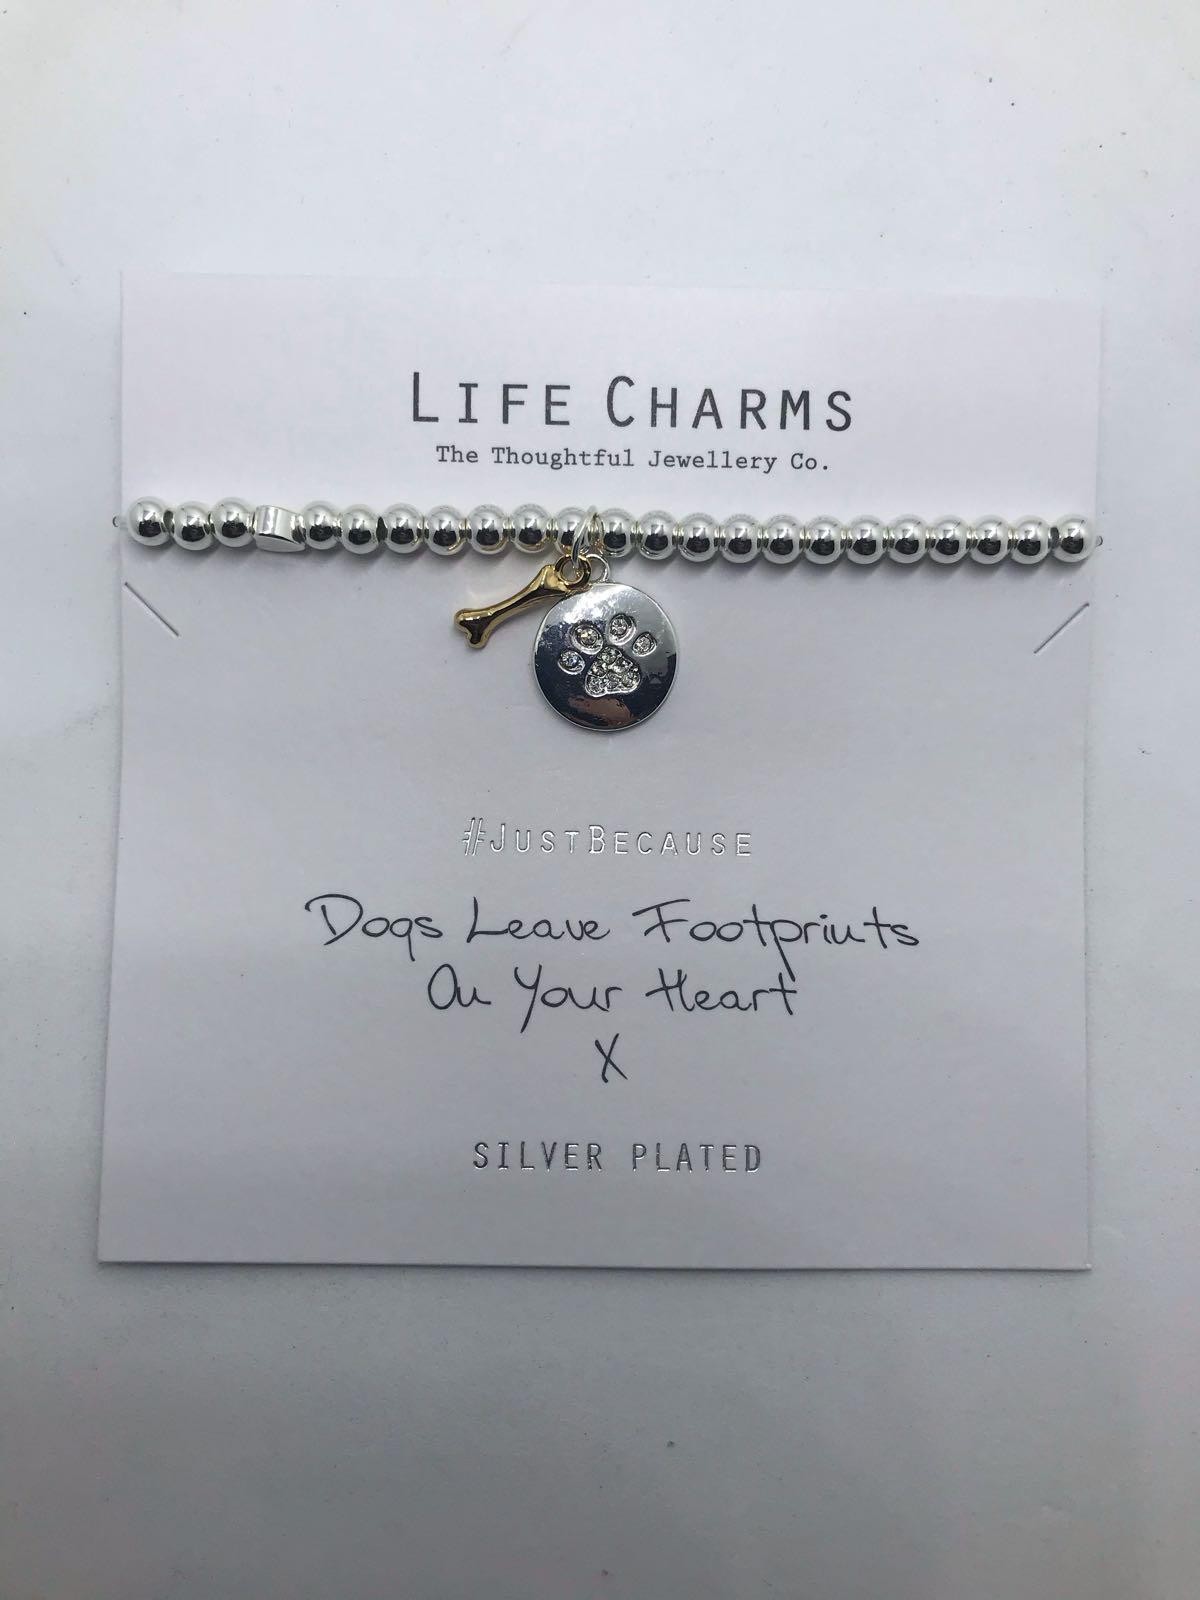 Life Charms dog bracelet